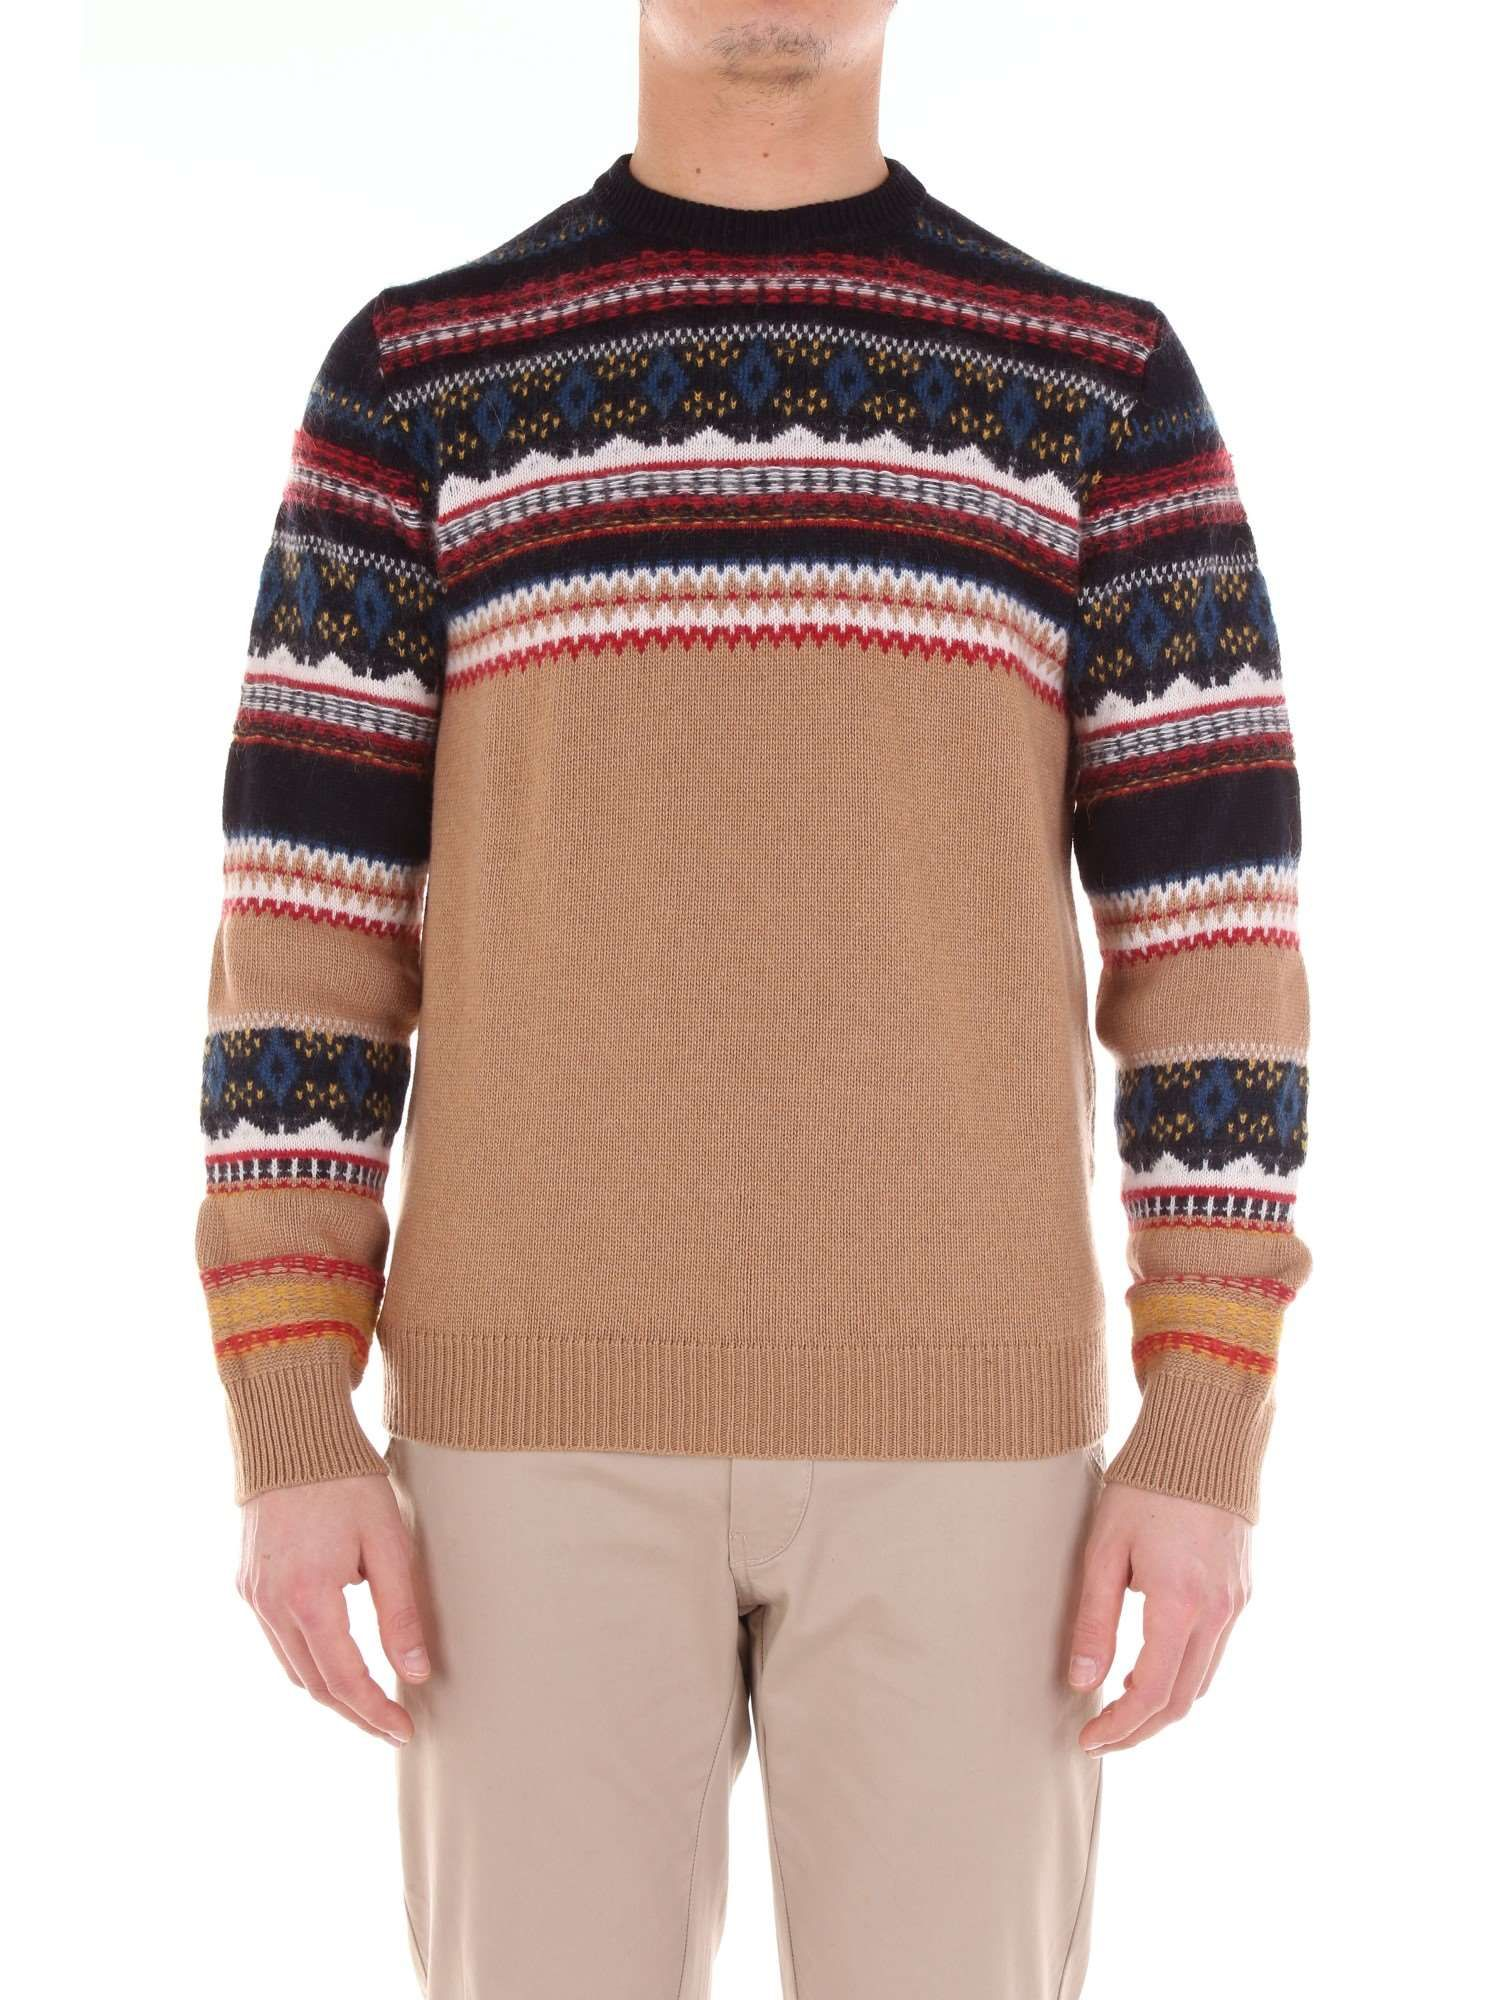 +39 MASQ MEN'S MA080220700BROWN BROWN WOOL Sweaters